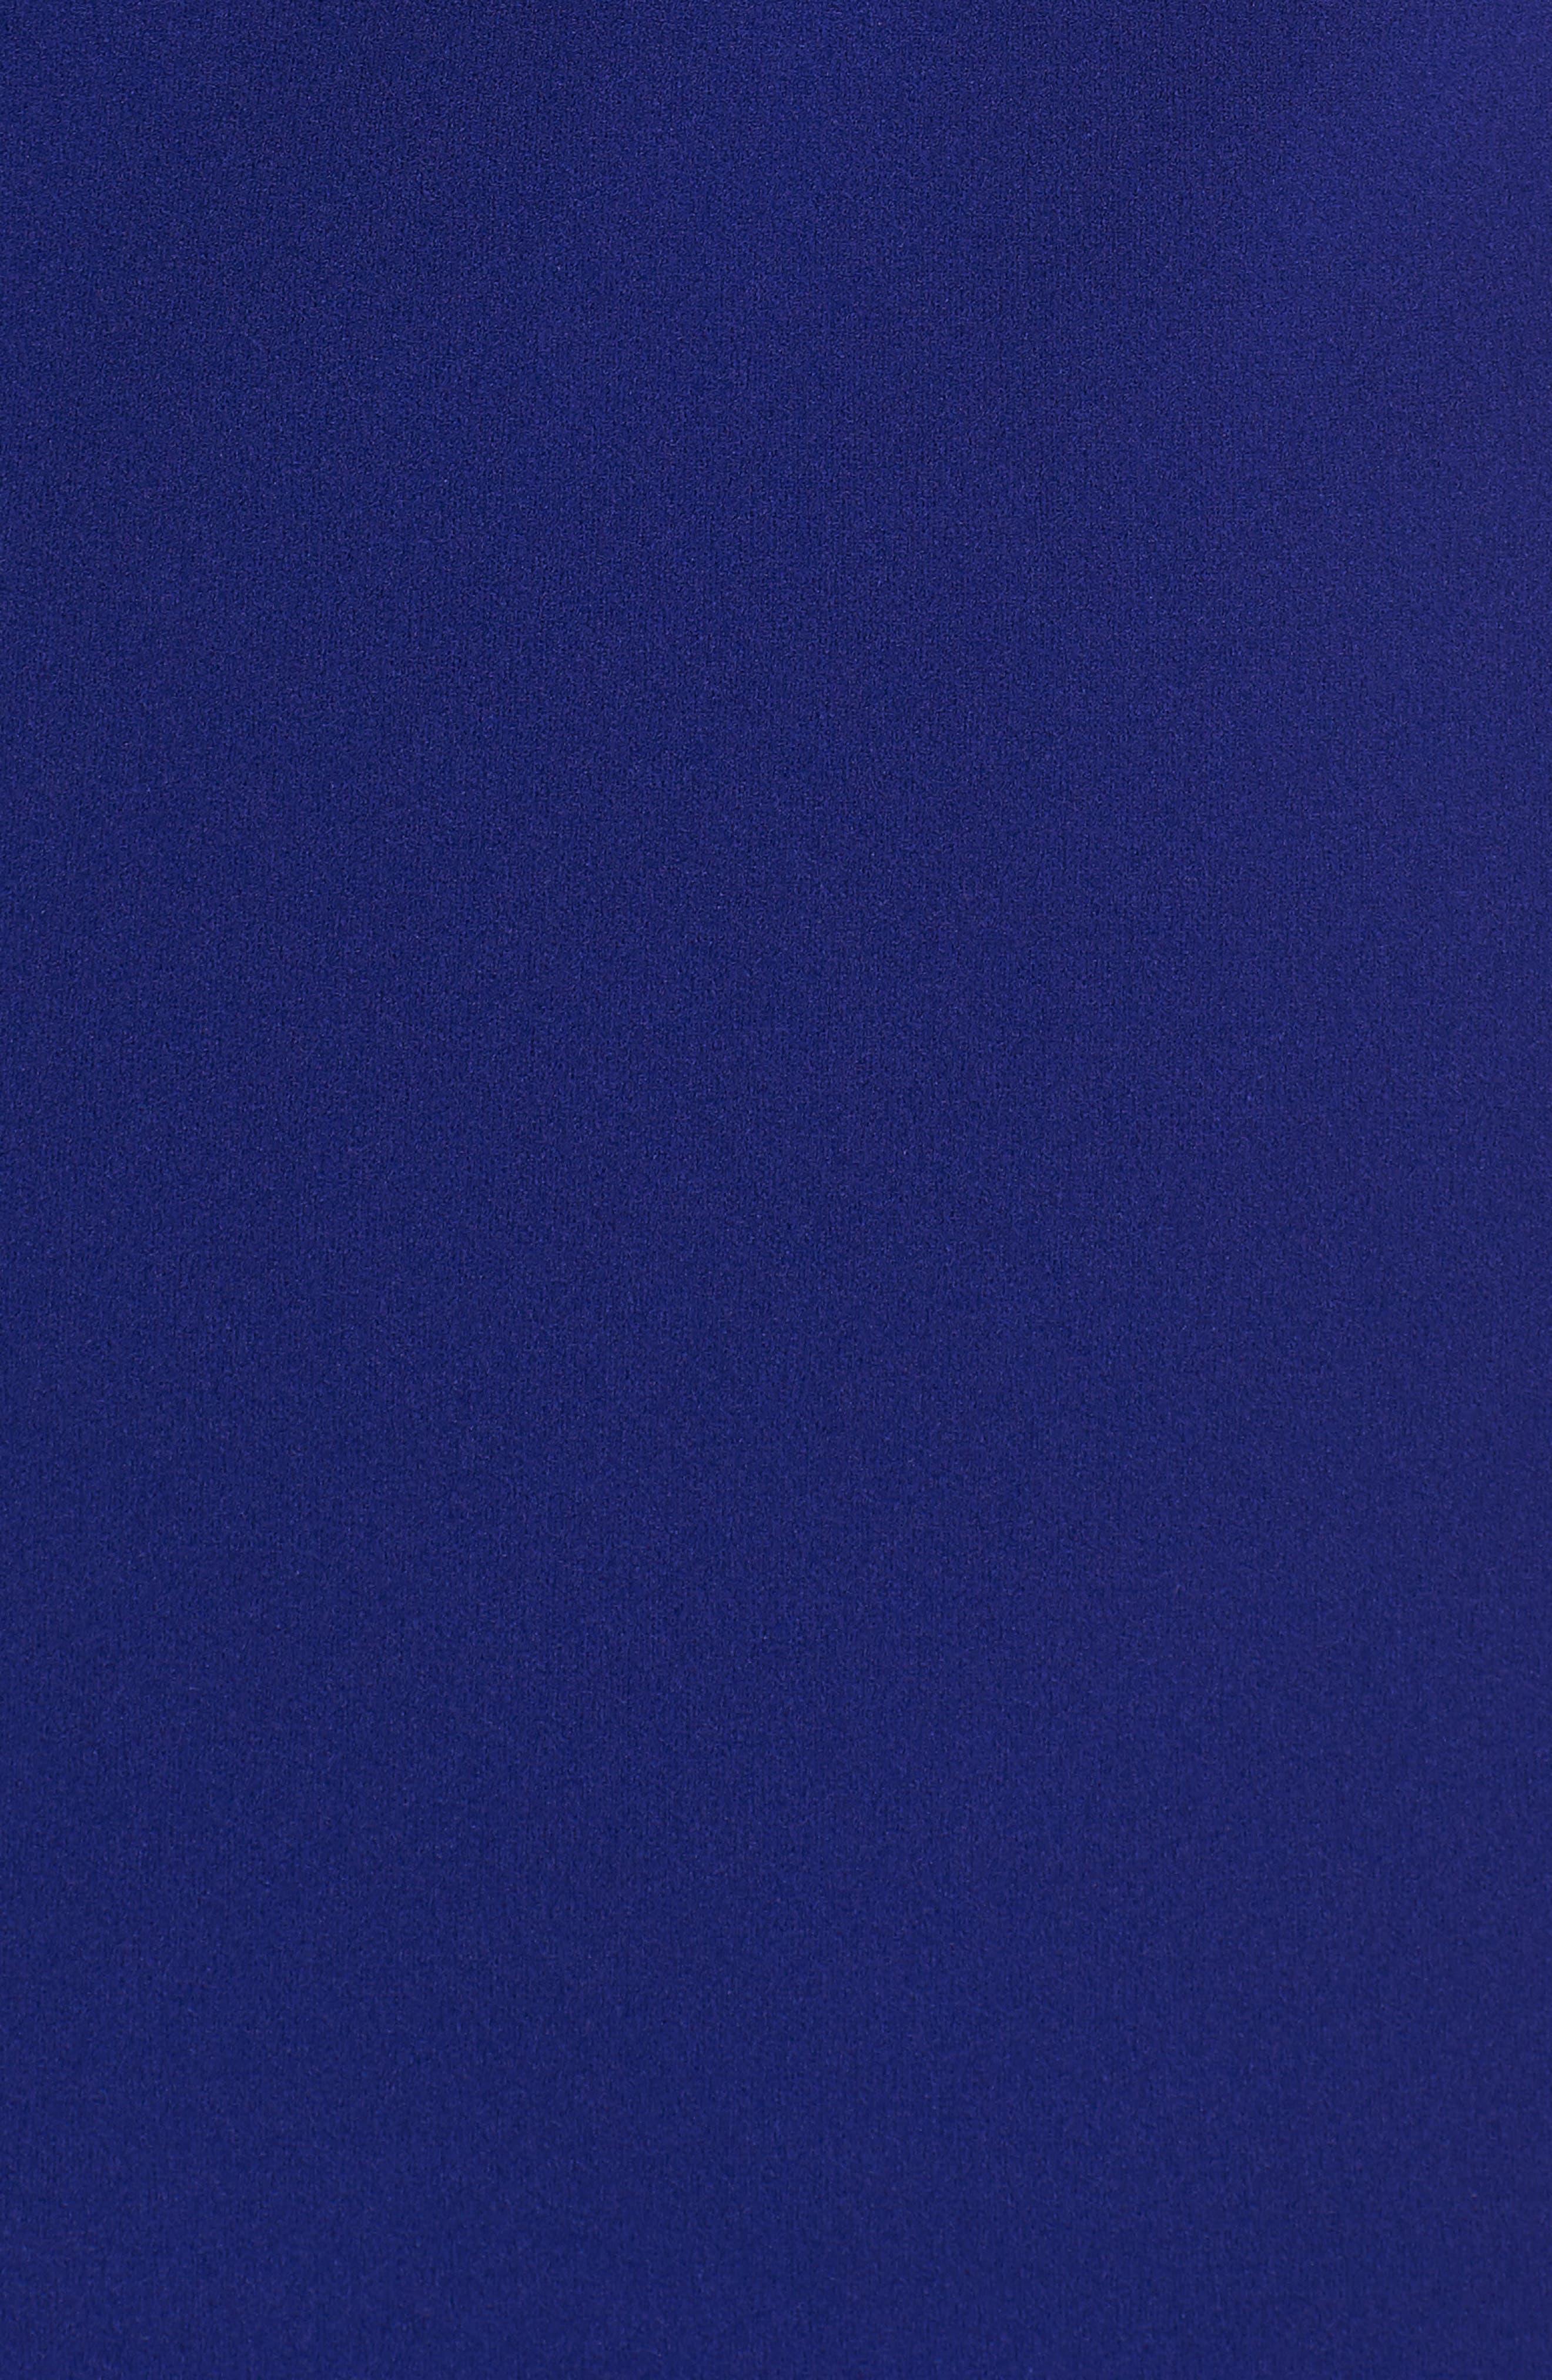 VINCE CAMUTO,                             Asymmetrical Ruffle Hem Scuba Crepe Dress,                             Alternate thumbnail 6, color,                             430